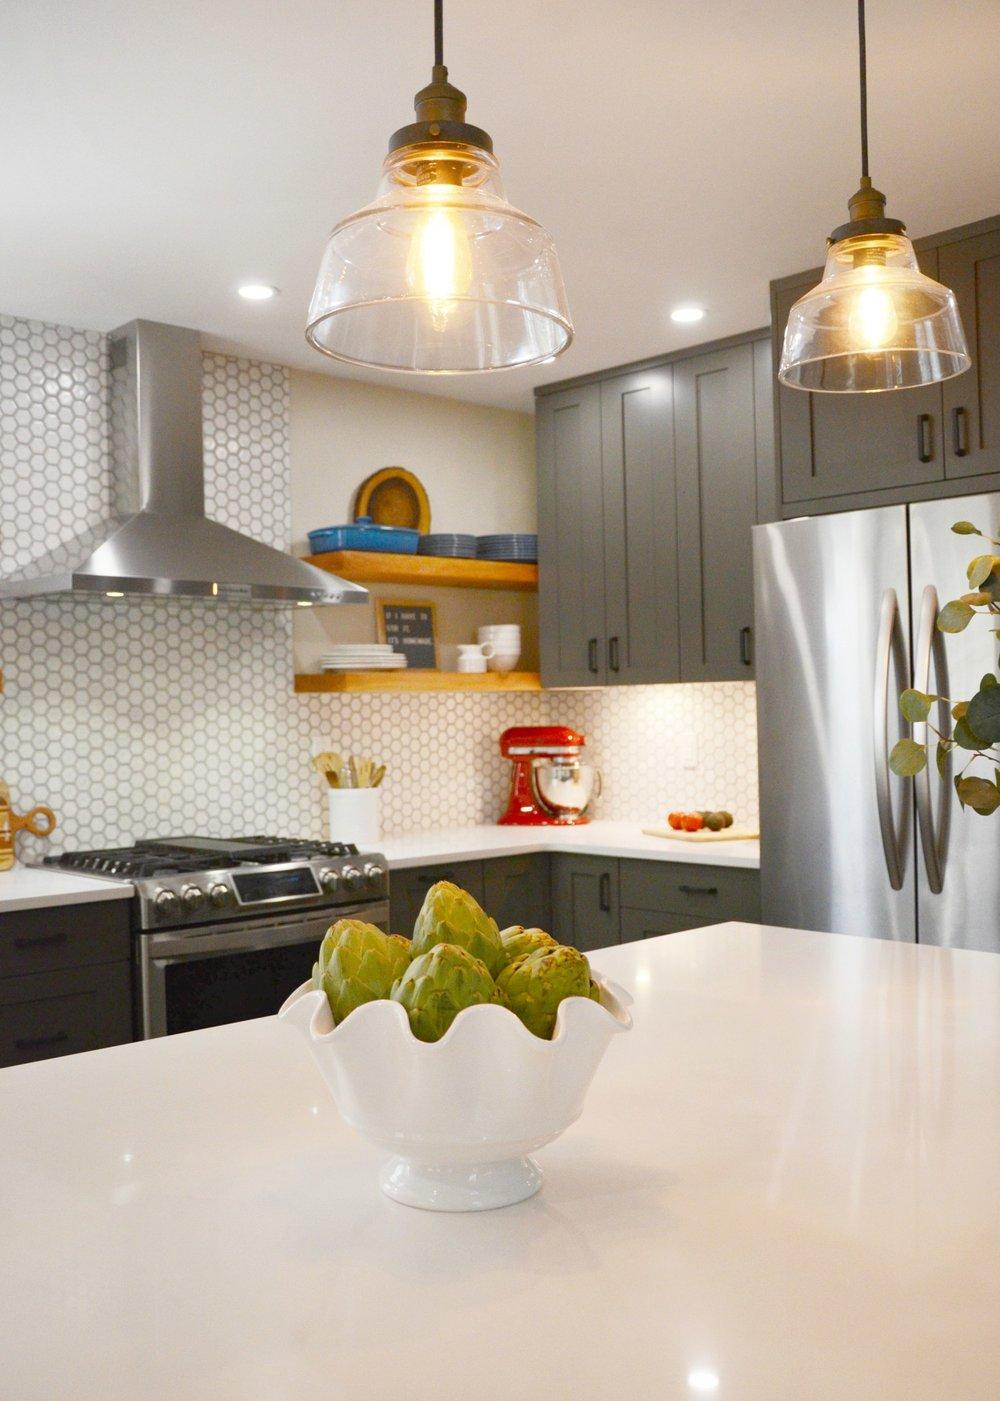 calgary-interior-design-kitchen-renovation-modern-farmhouse-38.jpg